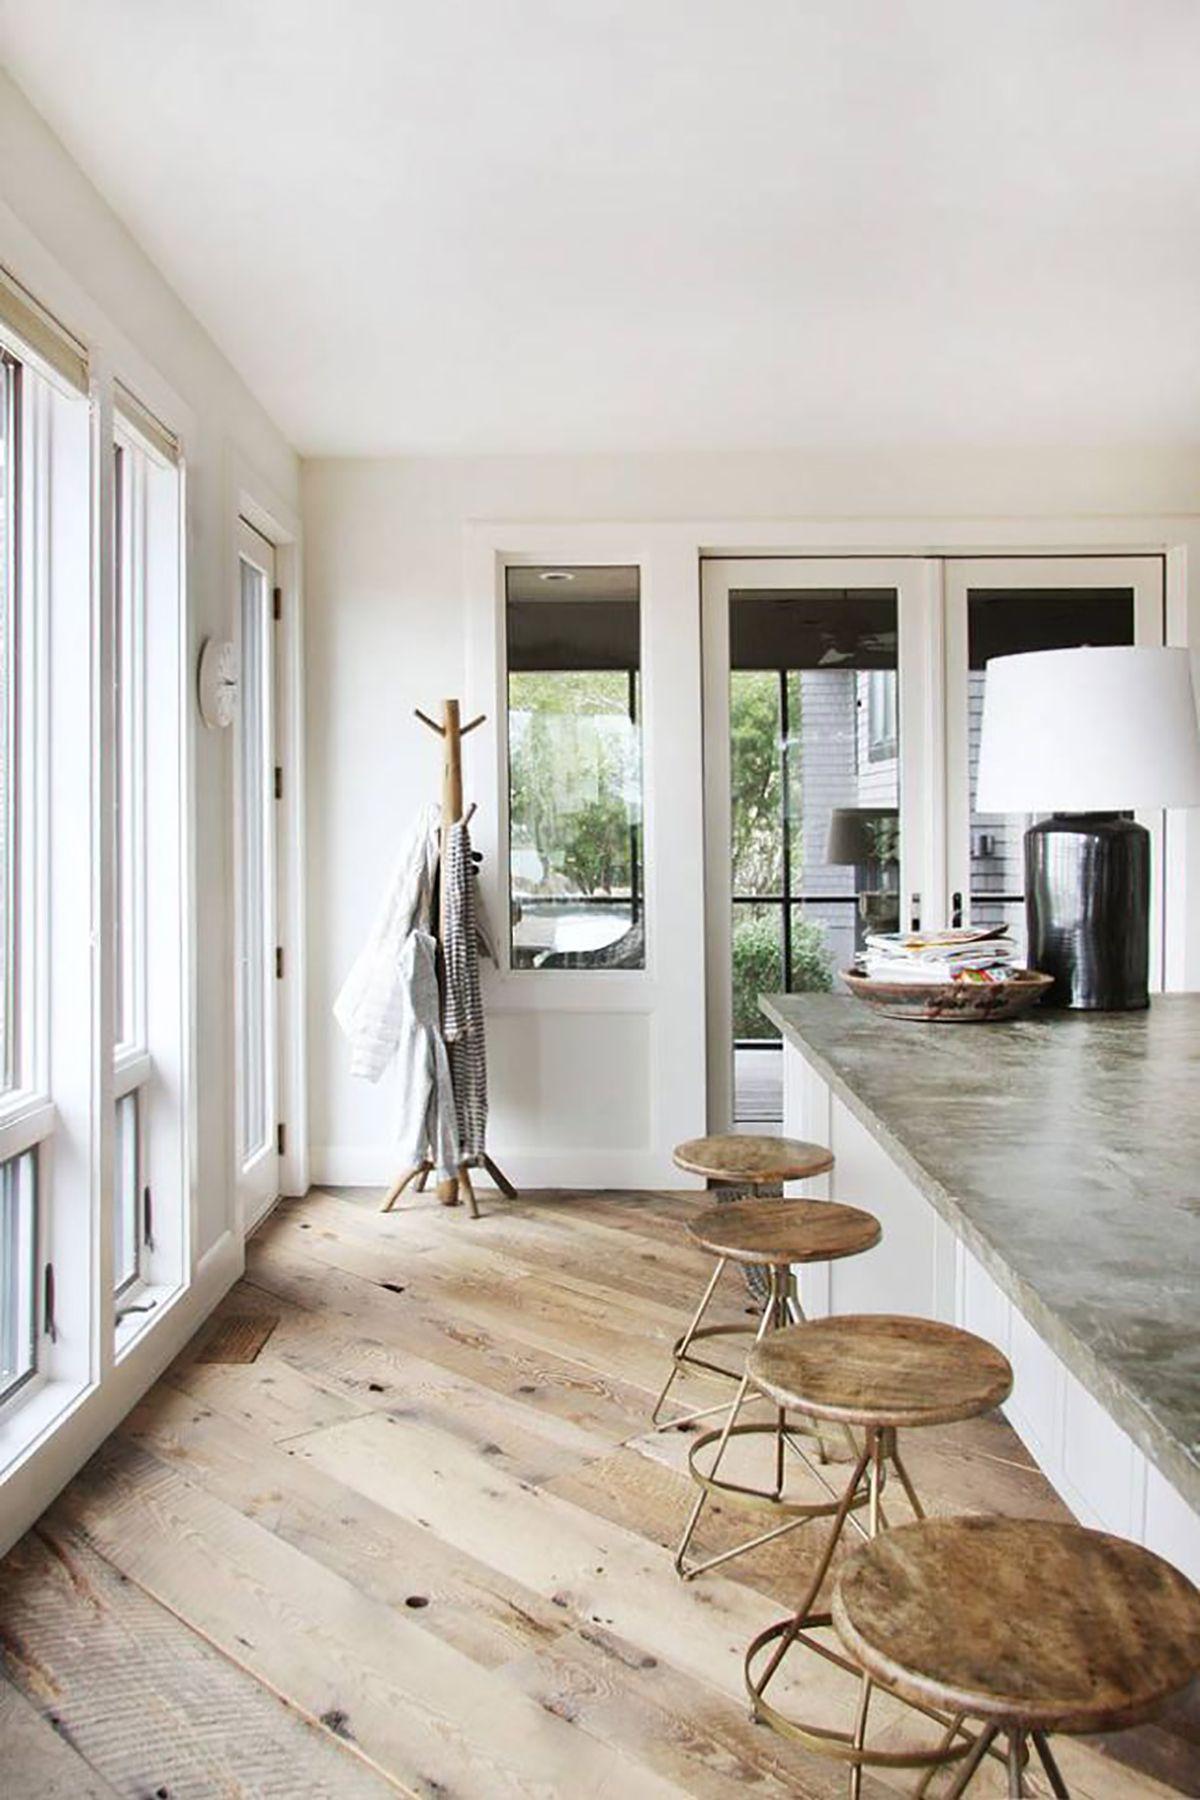 INTERIOR DESIGN IDEAS - HOME DECOR - wooden floor | Inspiring ...